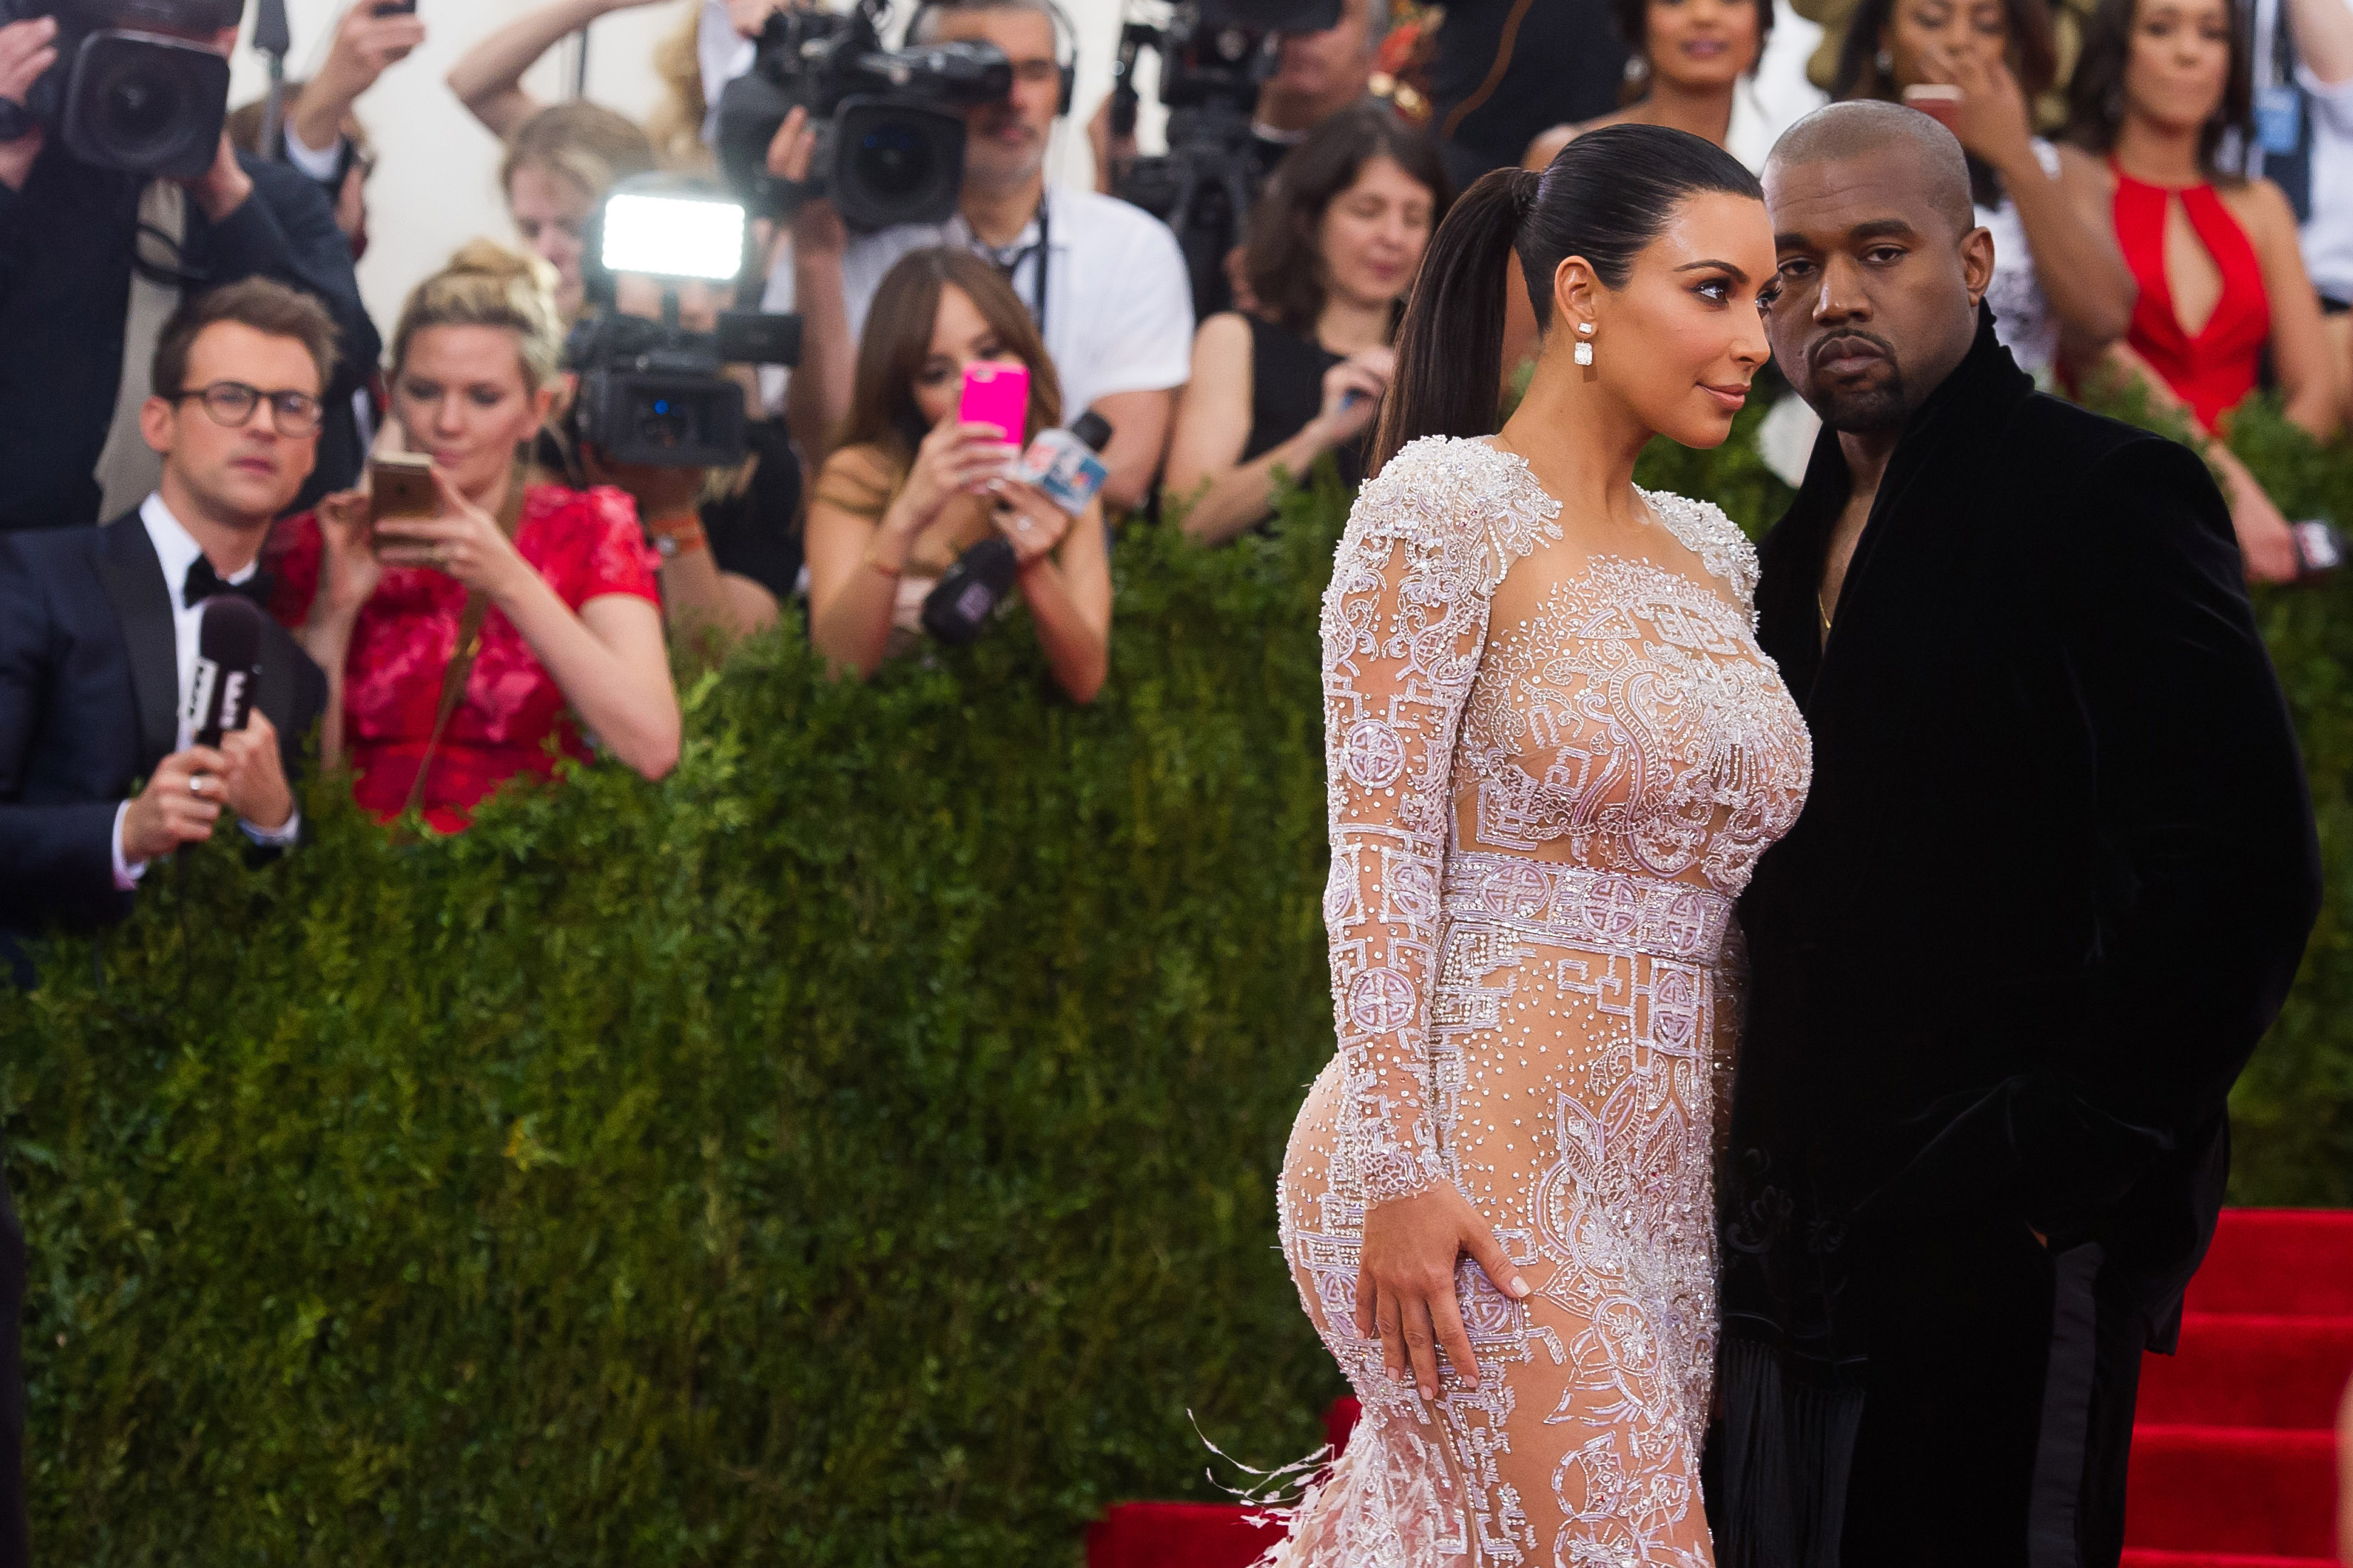 Ким Кардашян беременна во второй раз – СМИ